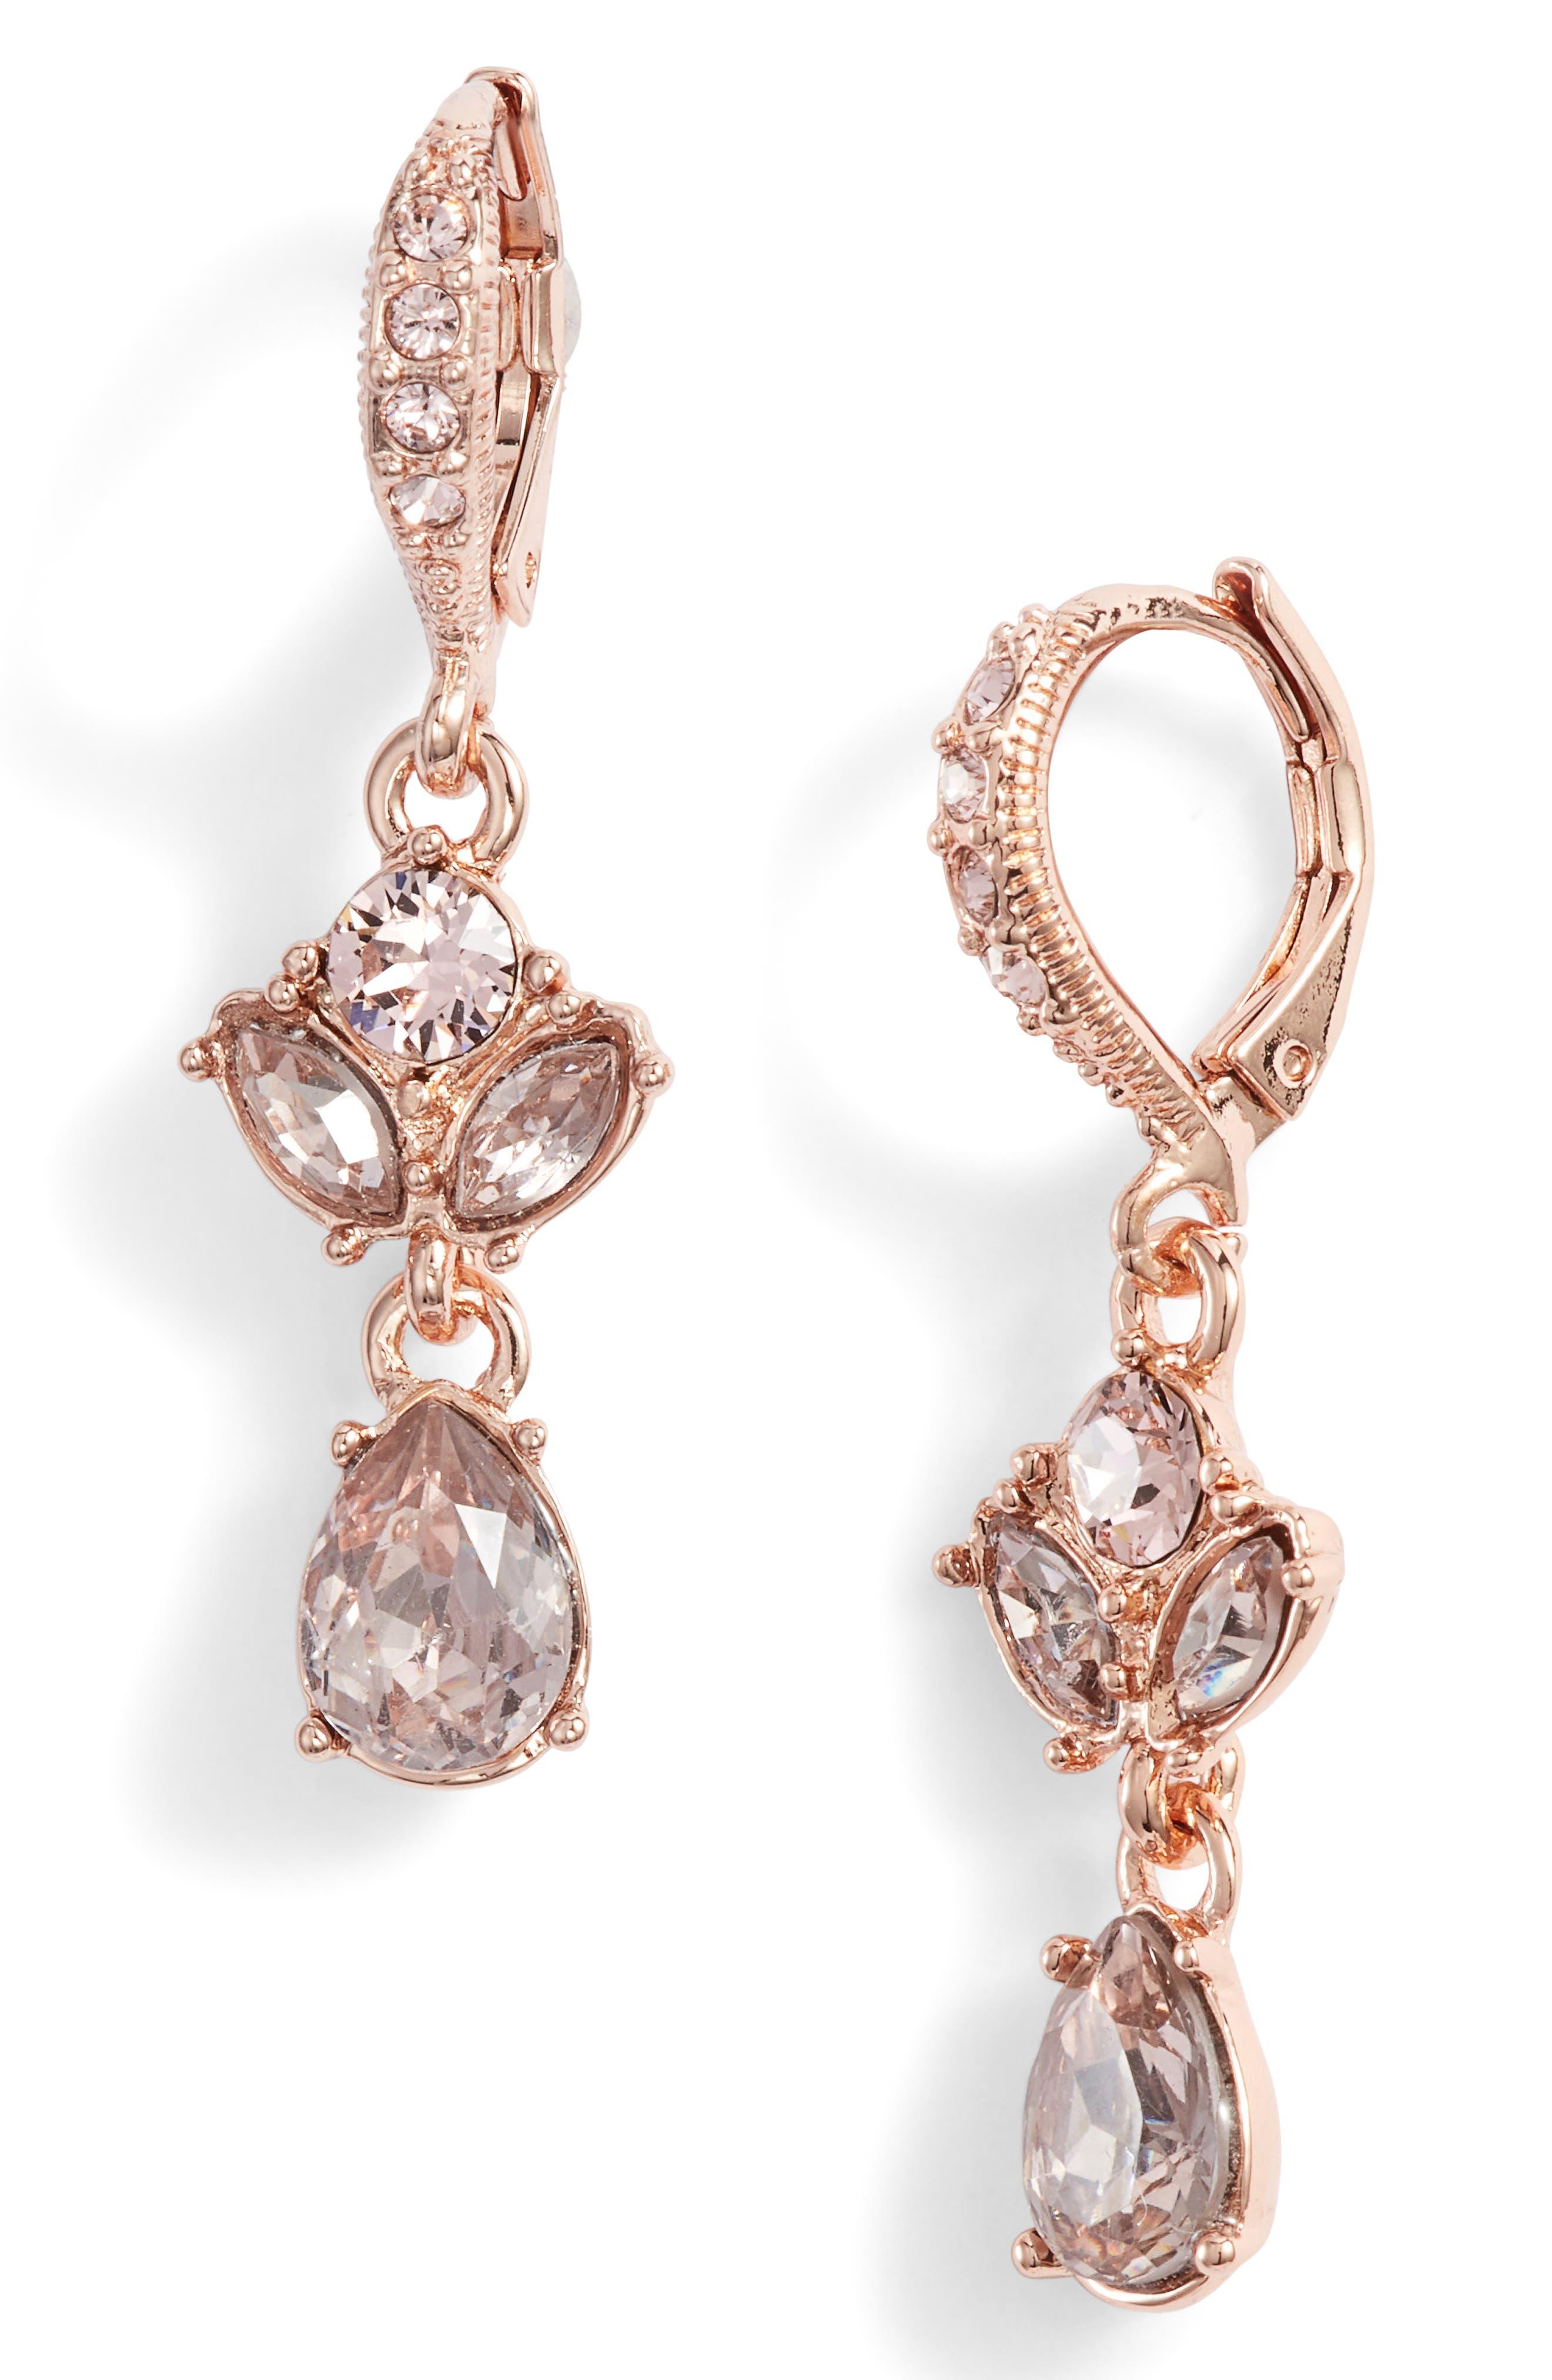 Small Crystal Drop Earrings,                             Main thumbnail 1, color,                             650